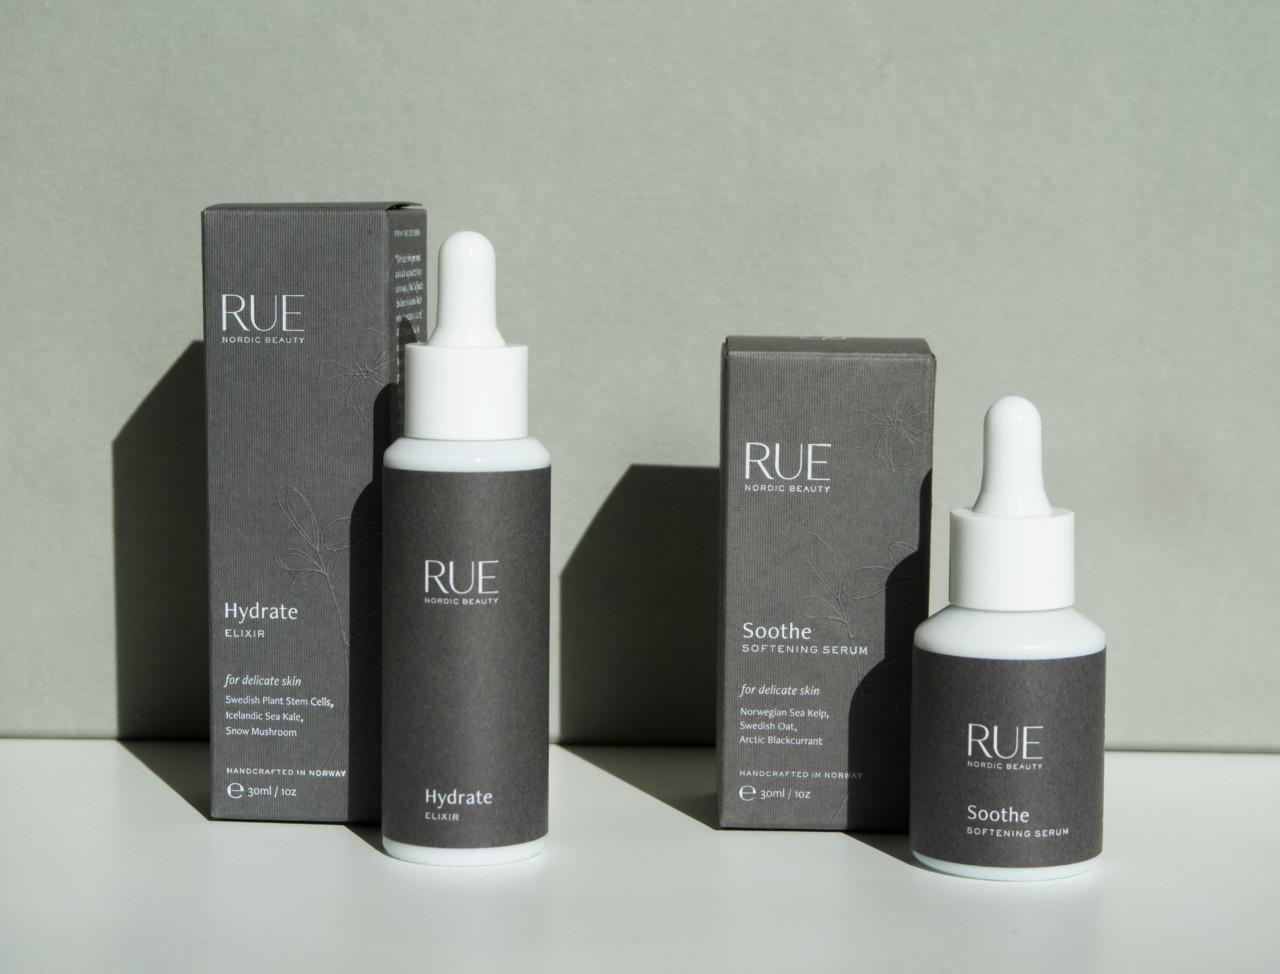 rue-series-kristina-dunn-soothe-hydrate-soften-serum